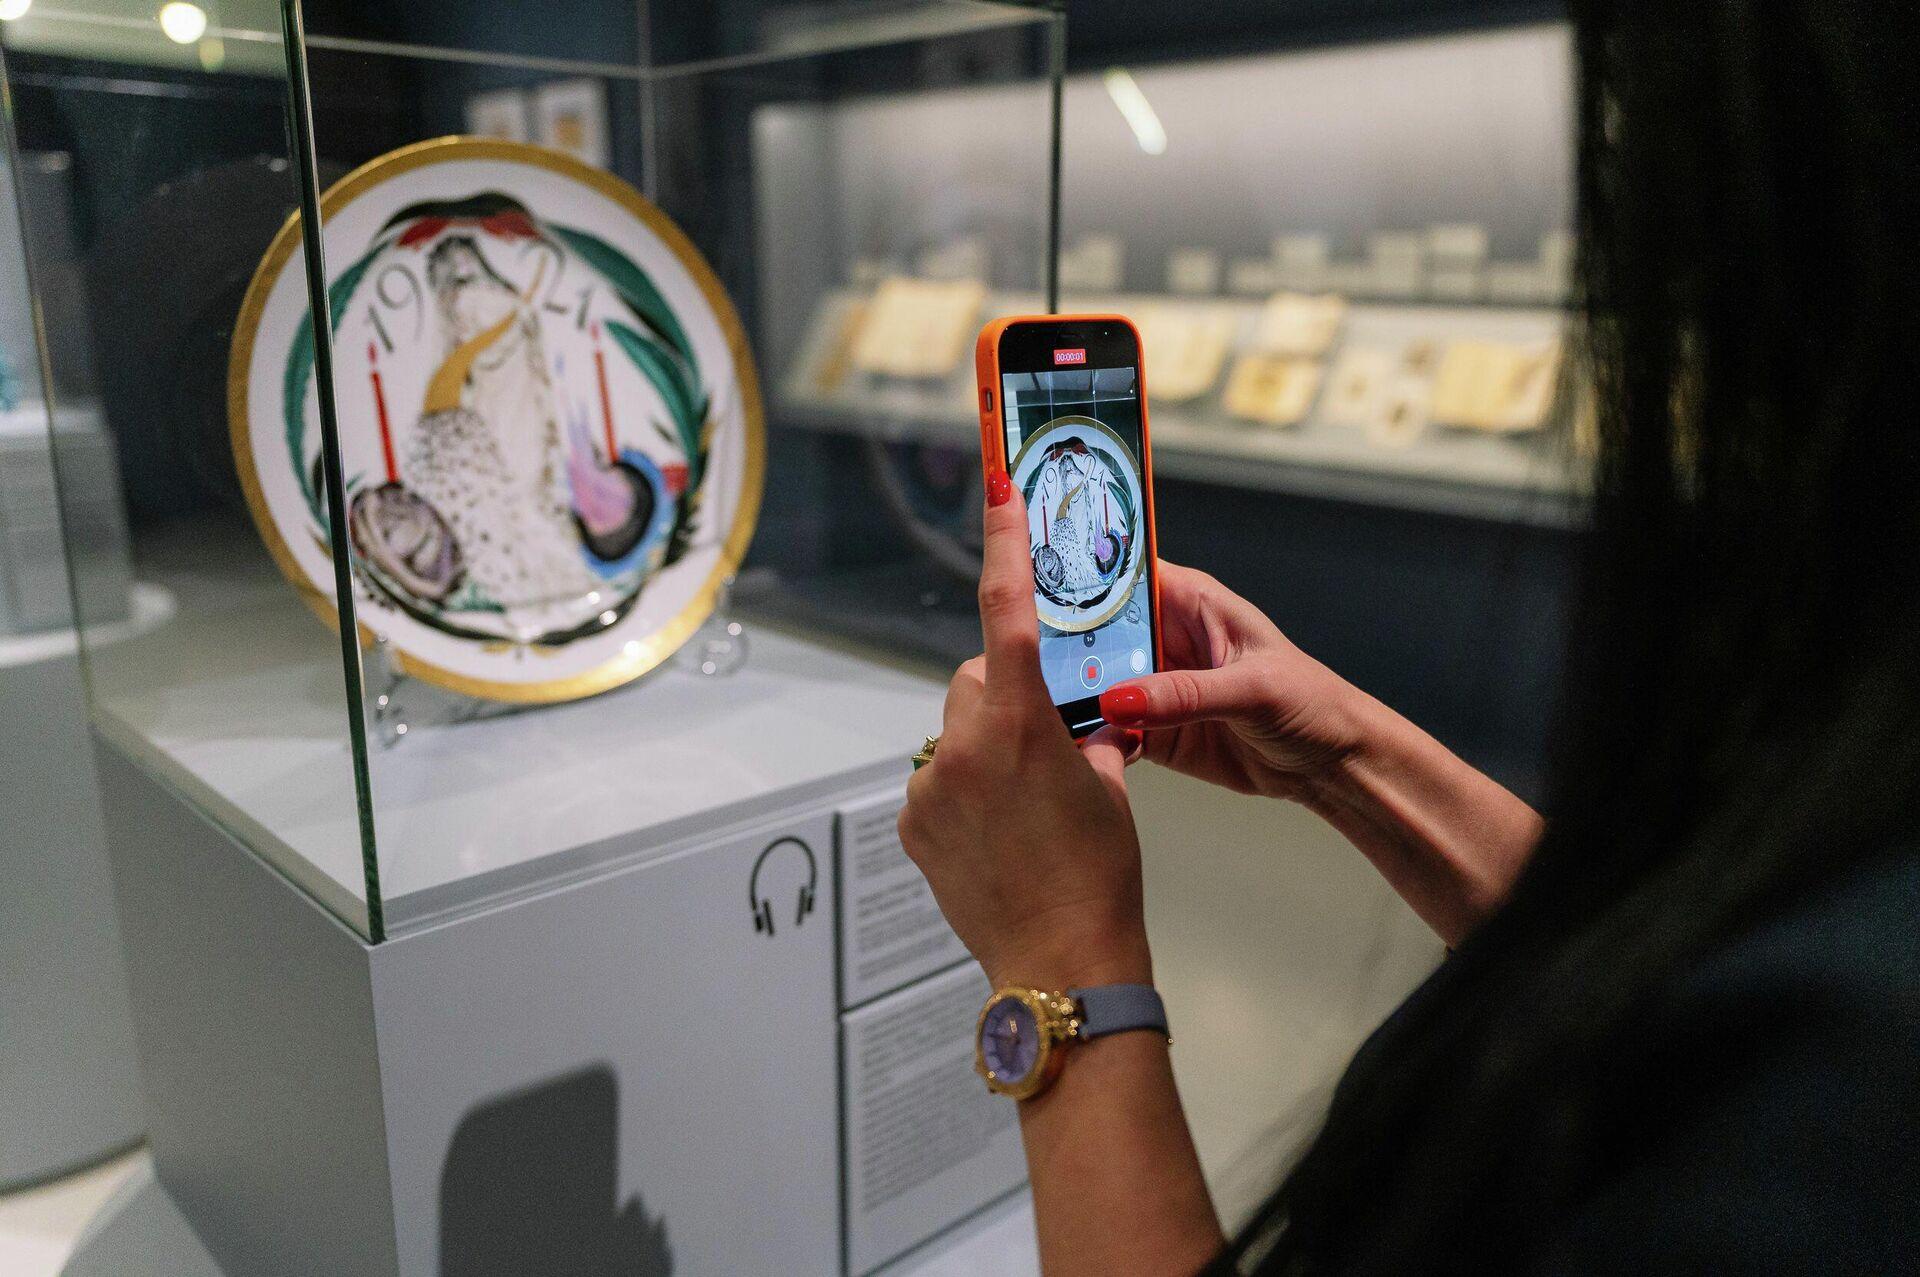 1750267789 0:0:2500:1663 1920x0 80 0 0 f781b9b029531f5f658113f839db7c76 - В Музее русского импрессионизма открылась выставка-детективное исследование